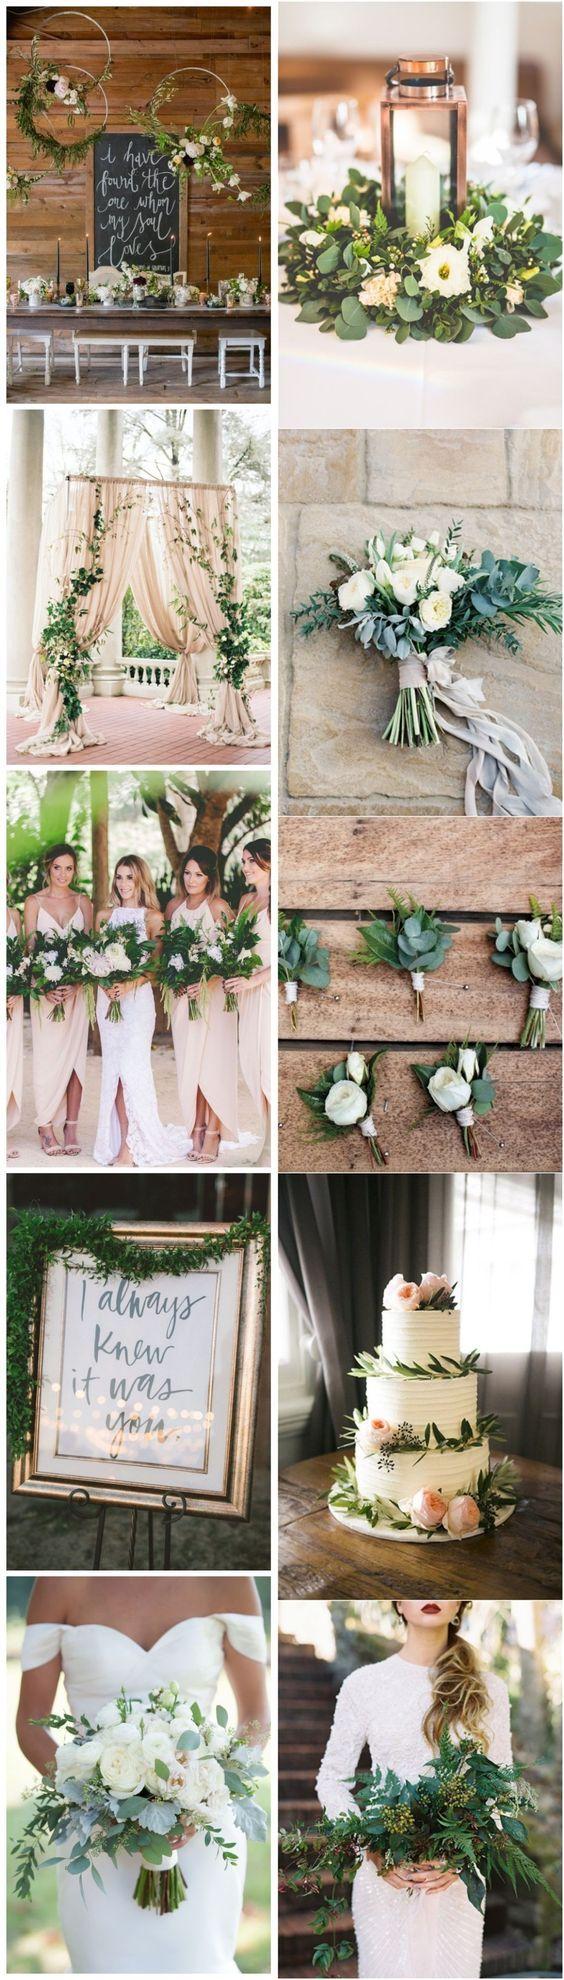 Greenery wedding color ideas 2017